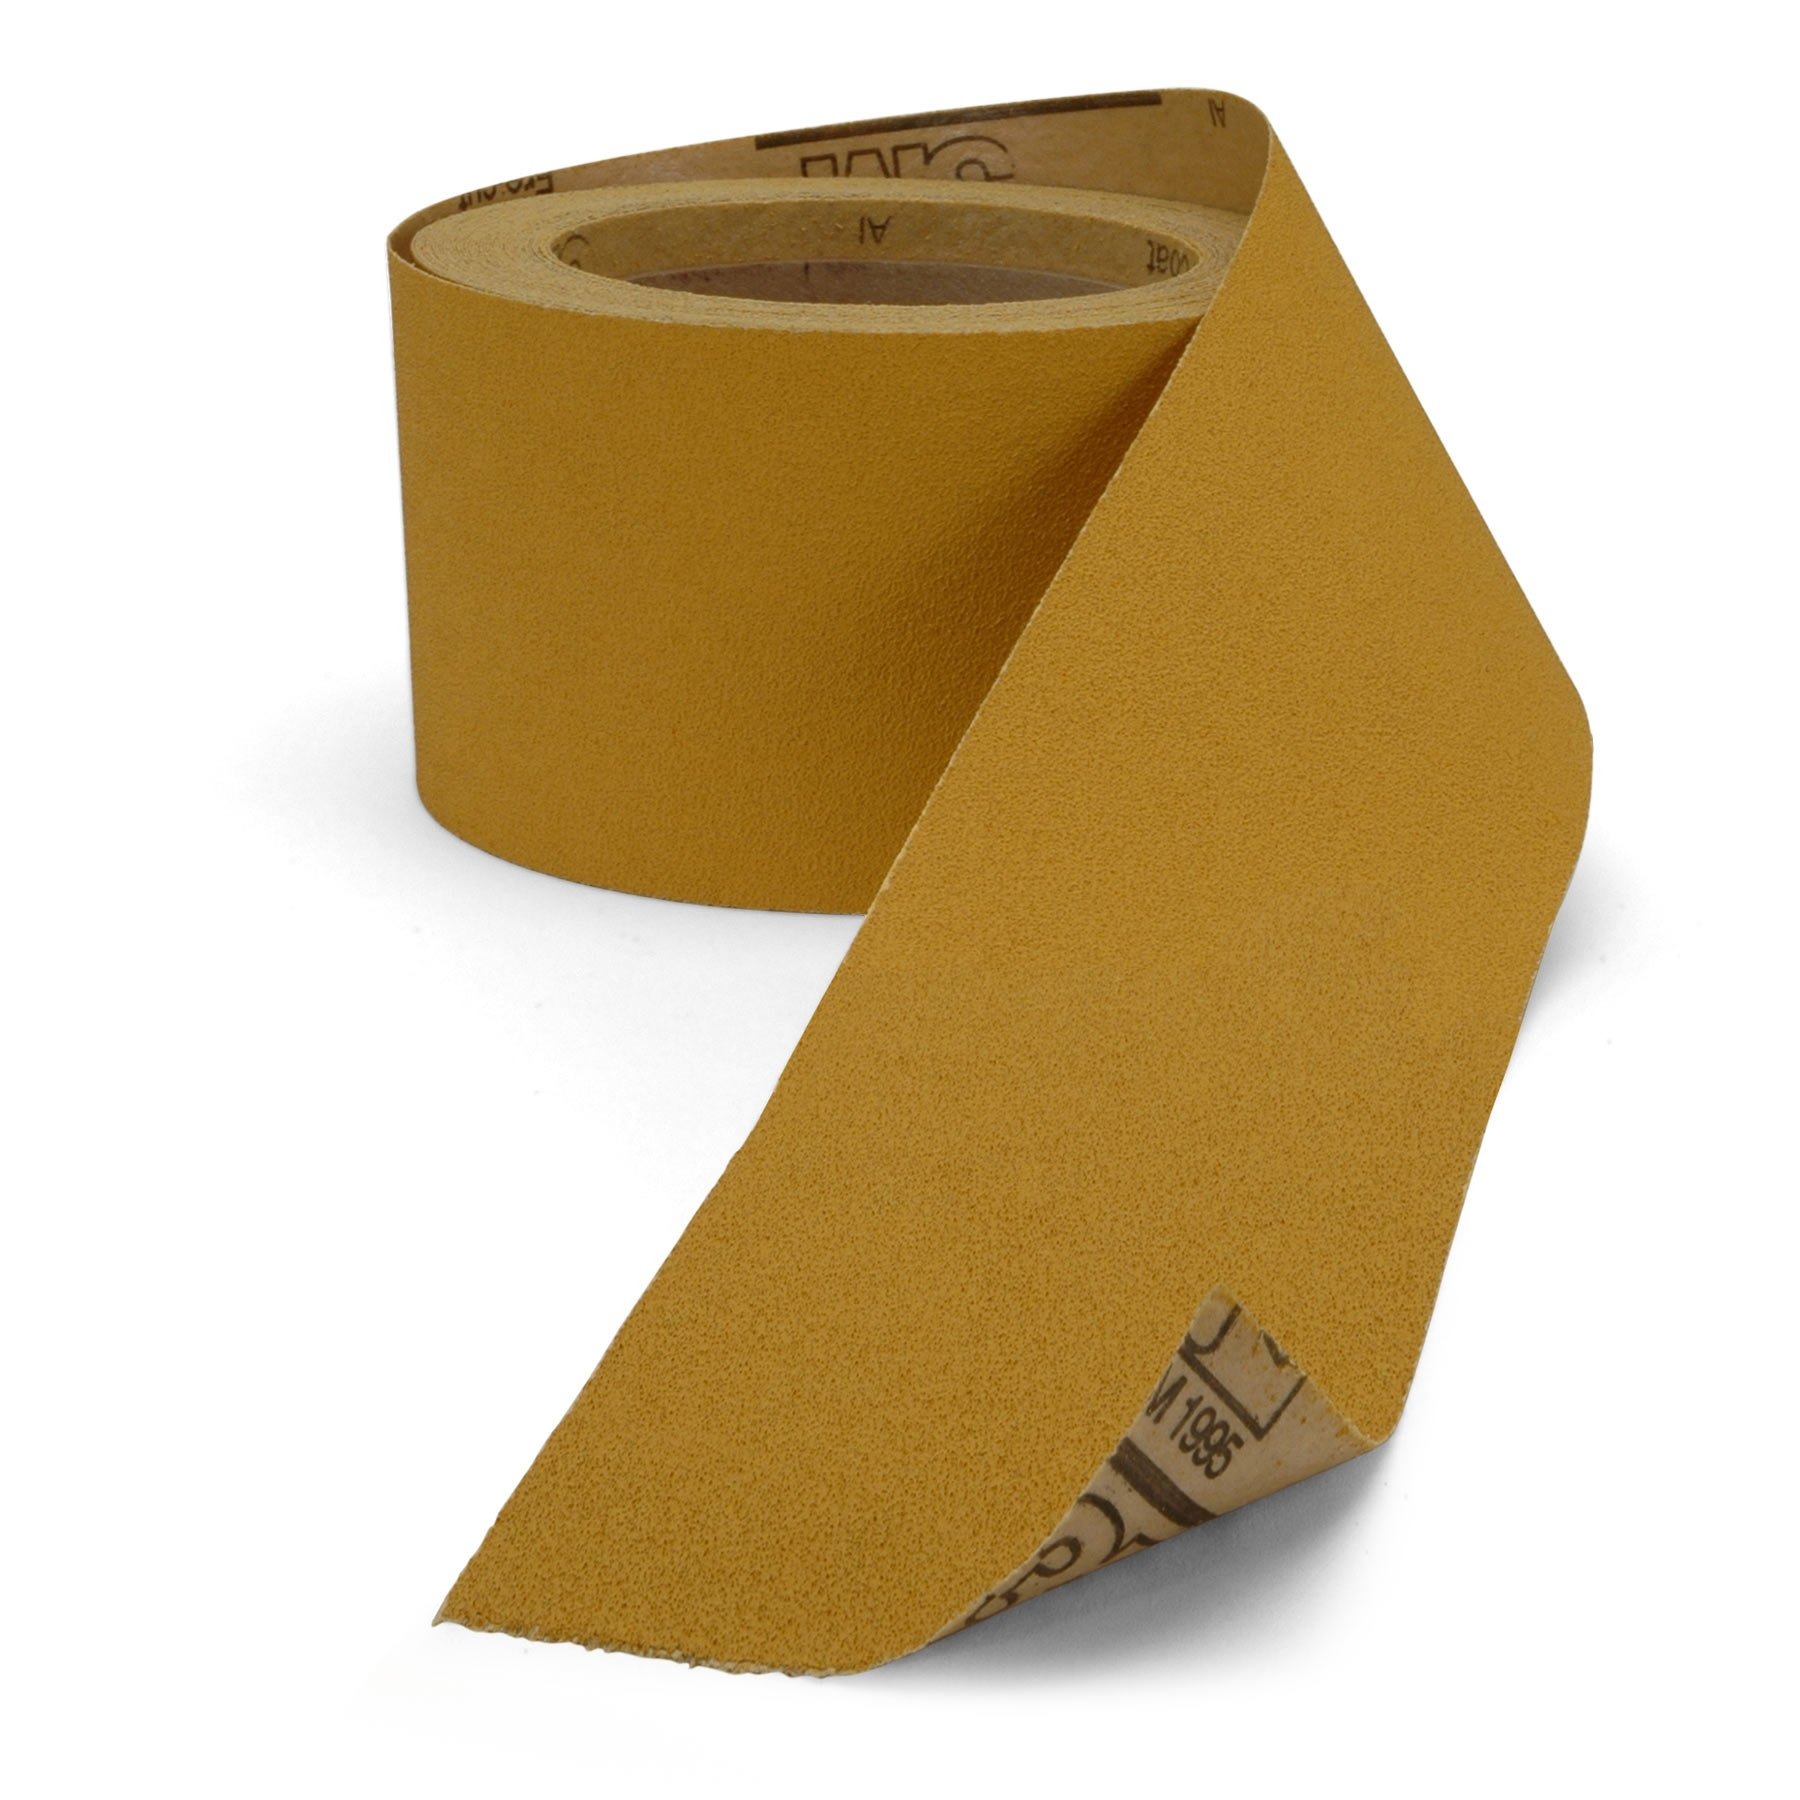 3M Stikit Self-Adhesive Abrasive, 80-Grit, 15-Yard Roll